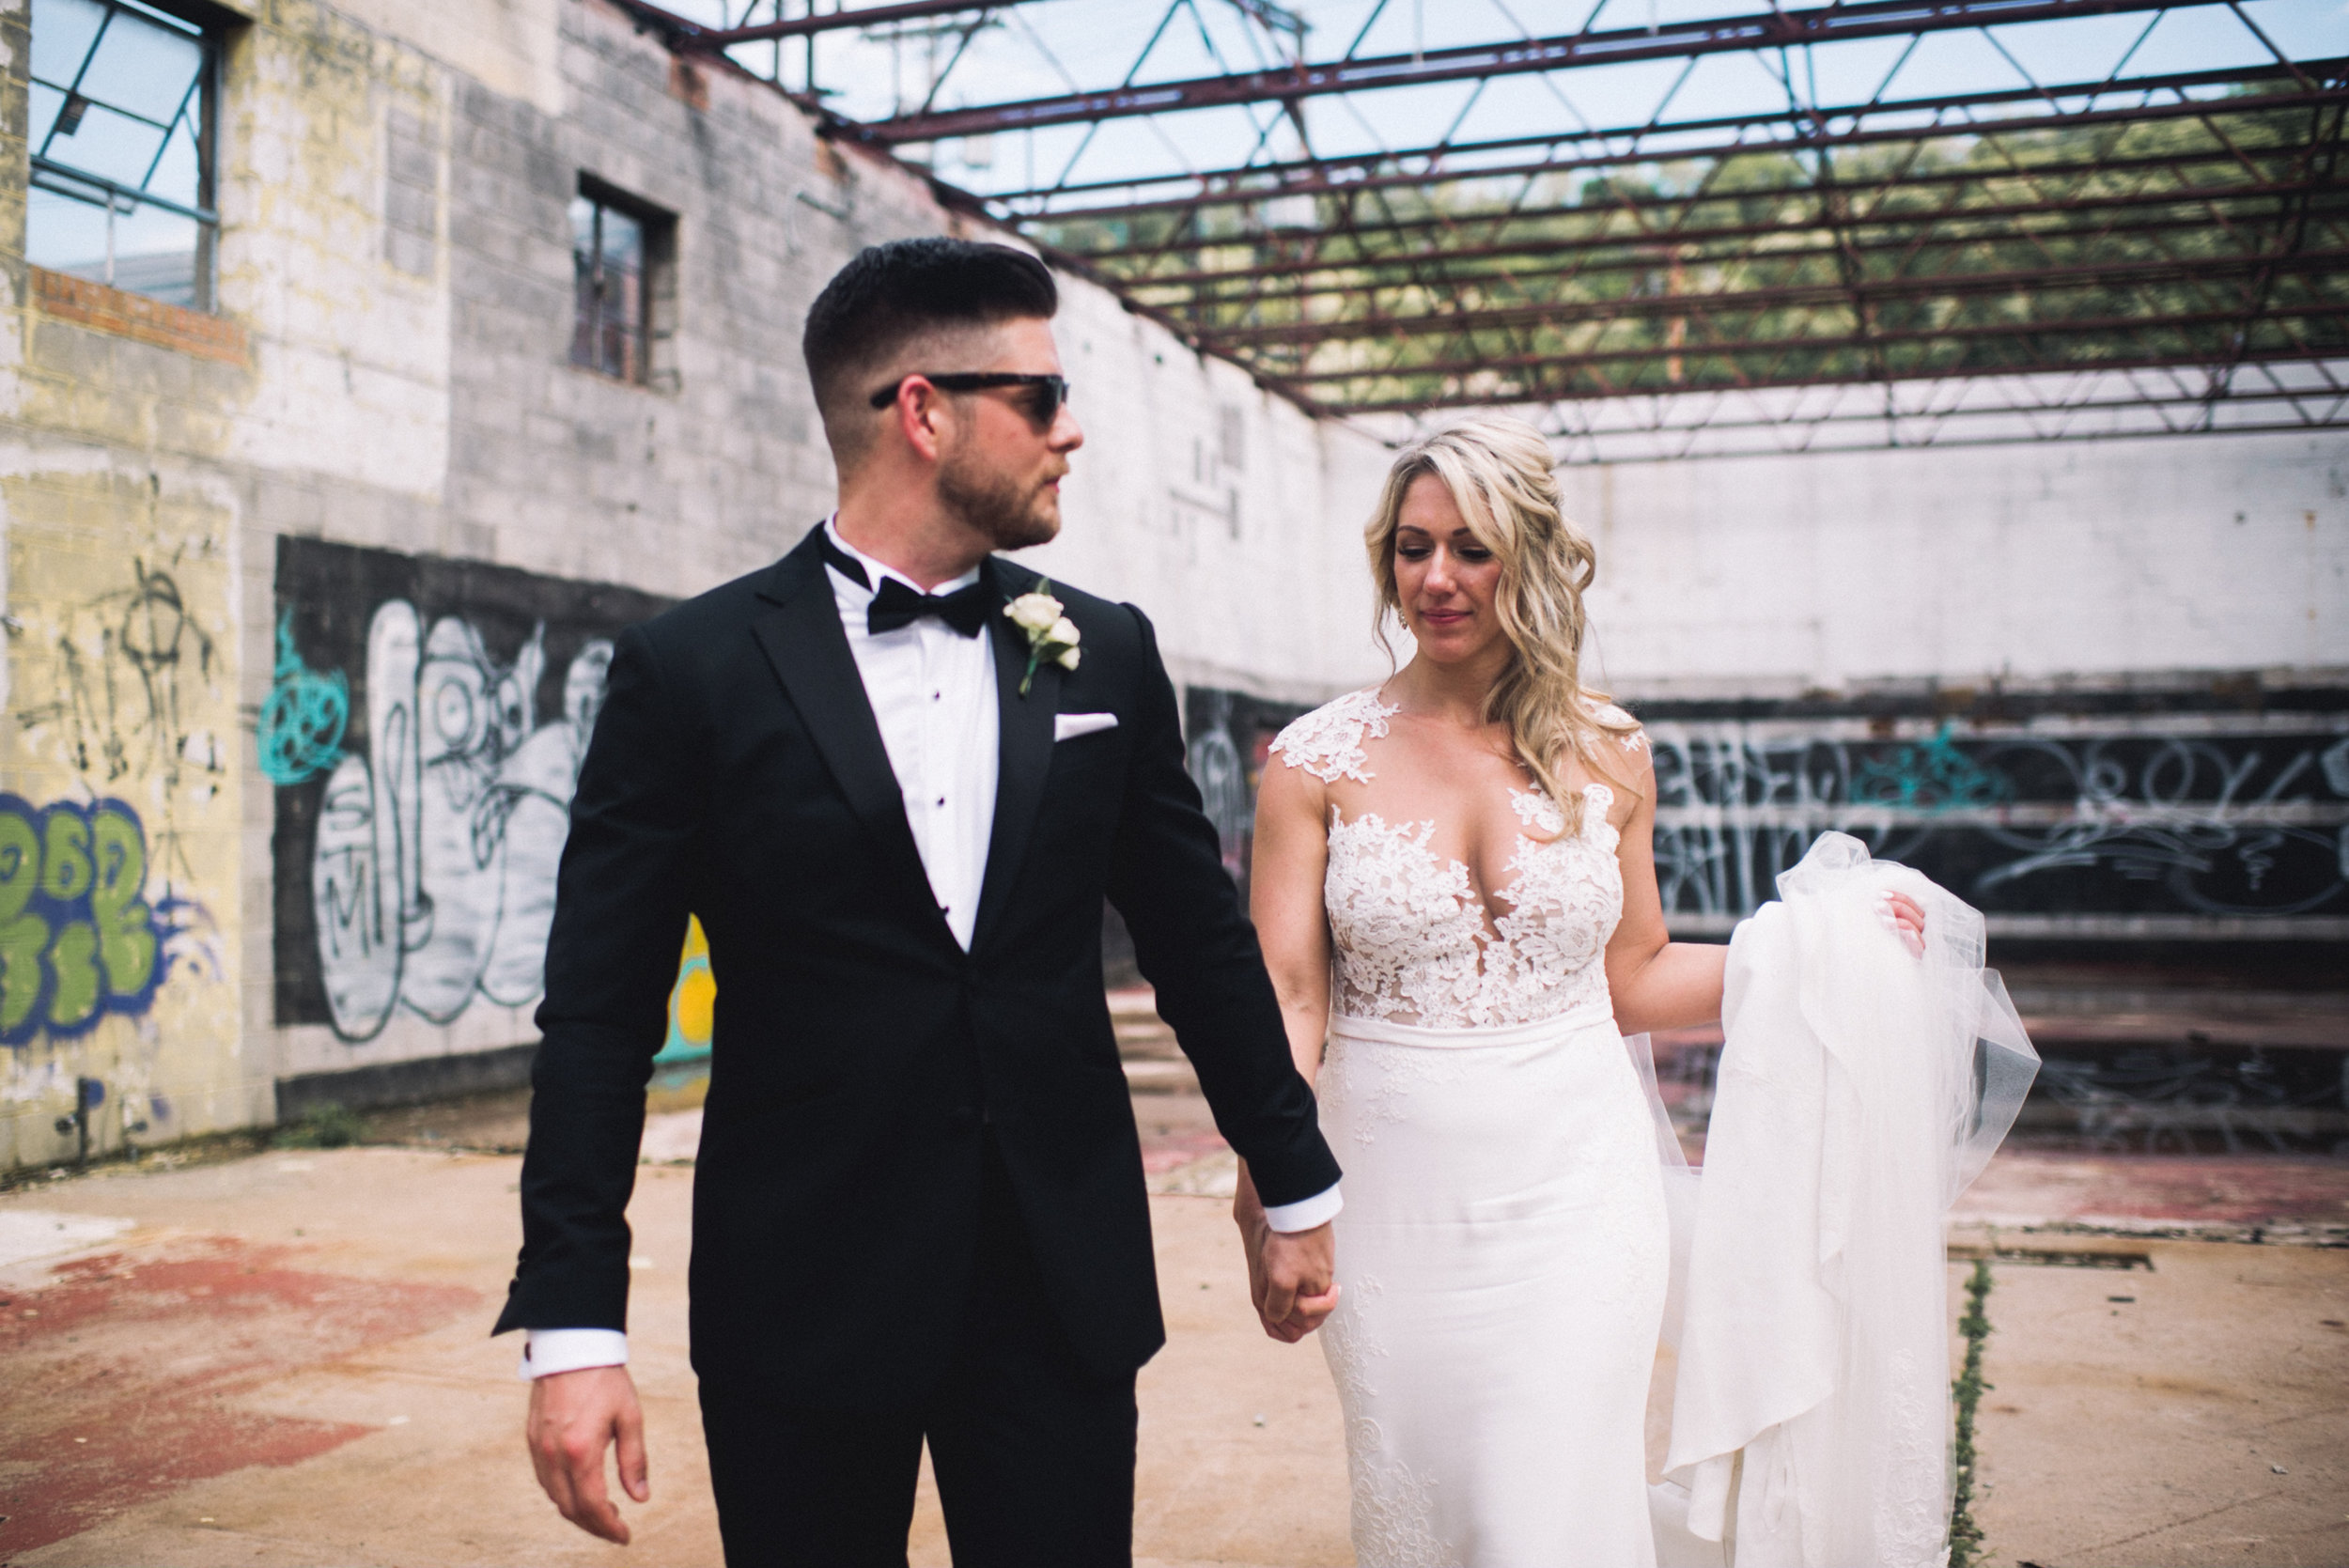 Pittsburgh Pennsylvania New York NYC Wedding Photographer Photojournalist Luxury Downtown Opera - Stirpe 1104.jpg